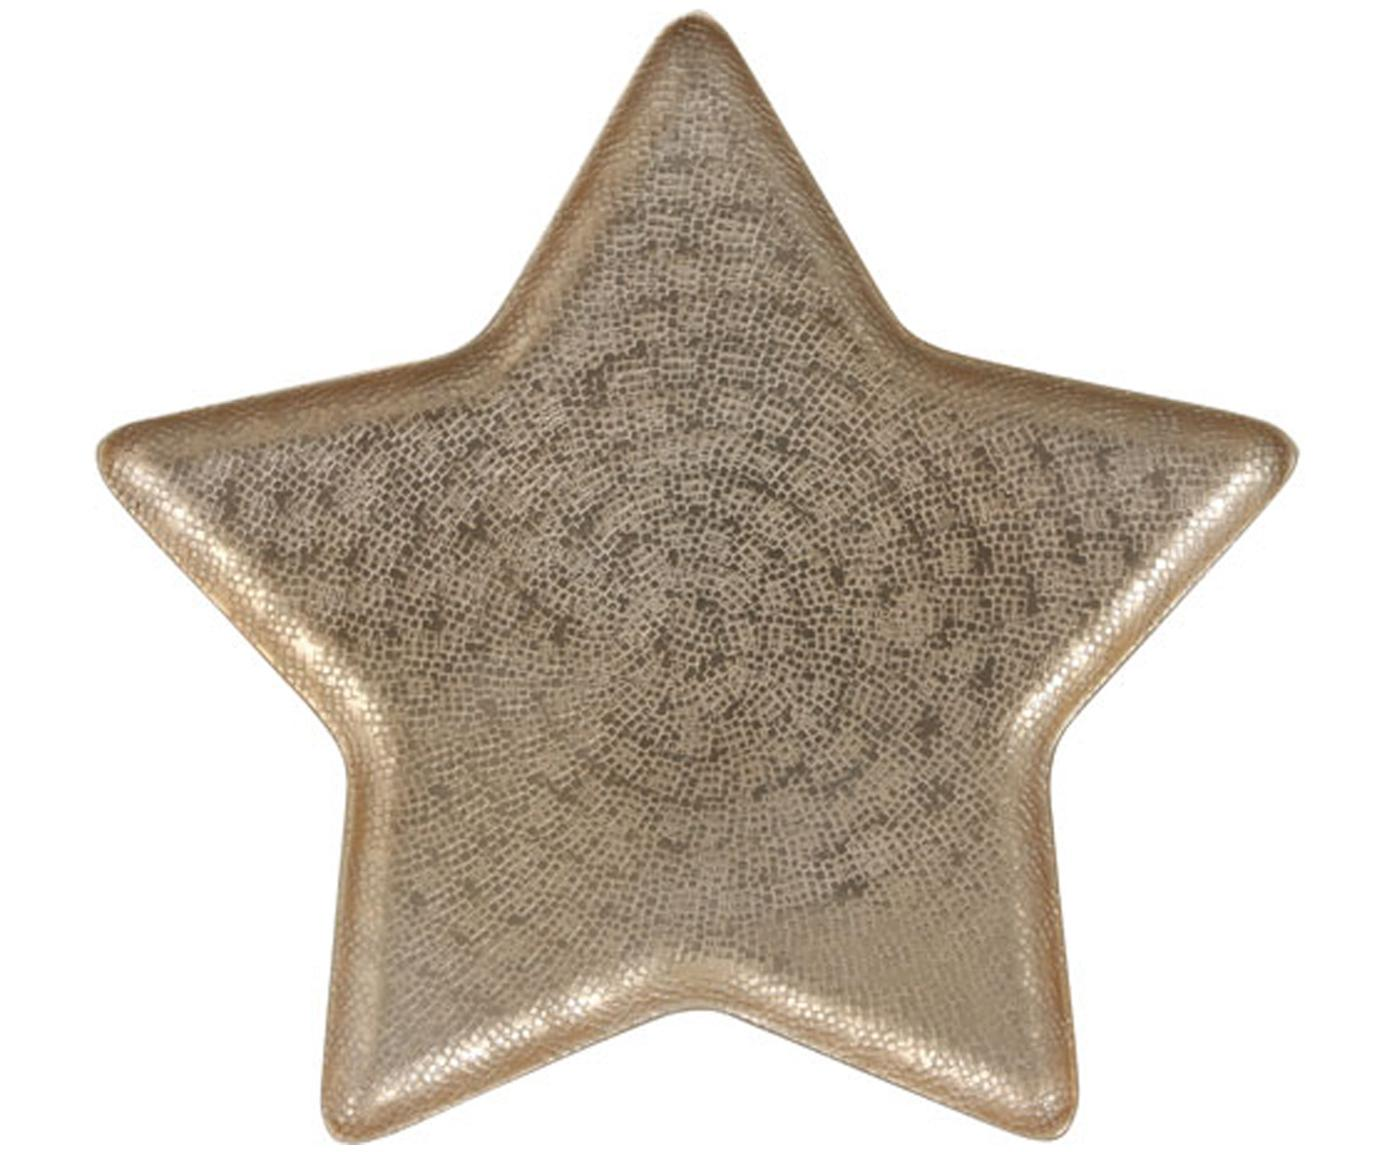 Decoratieve schaal Star, Gecoat aluminium, Mat messingkleurig, 33 x 2 cm